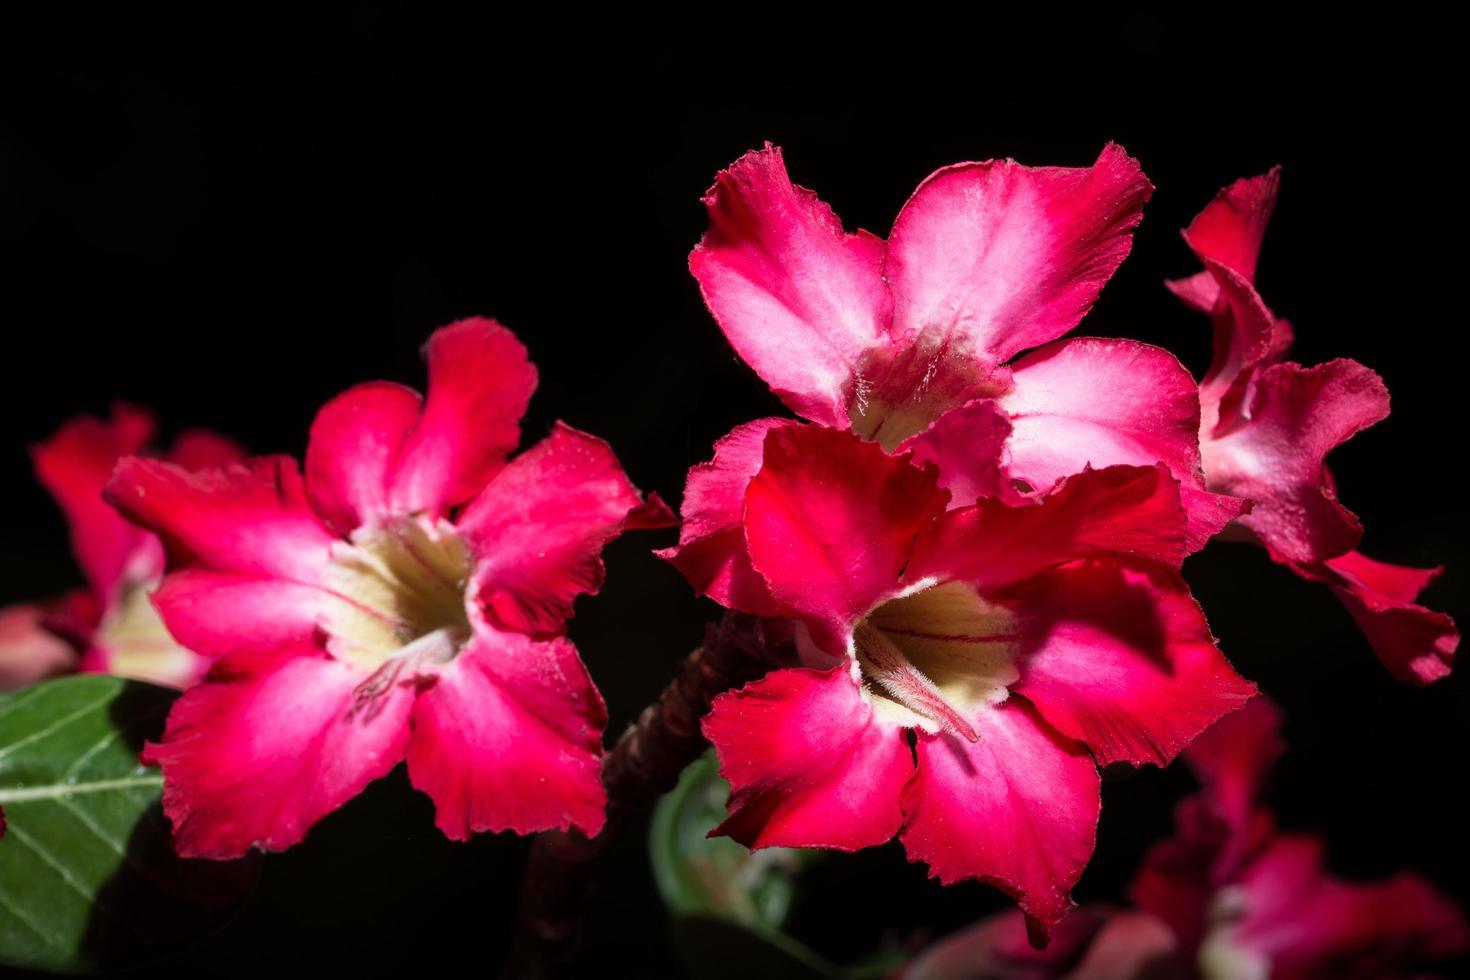 flores rojas sobre fondo negro foto